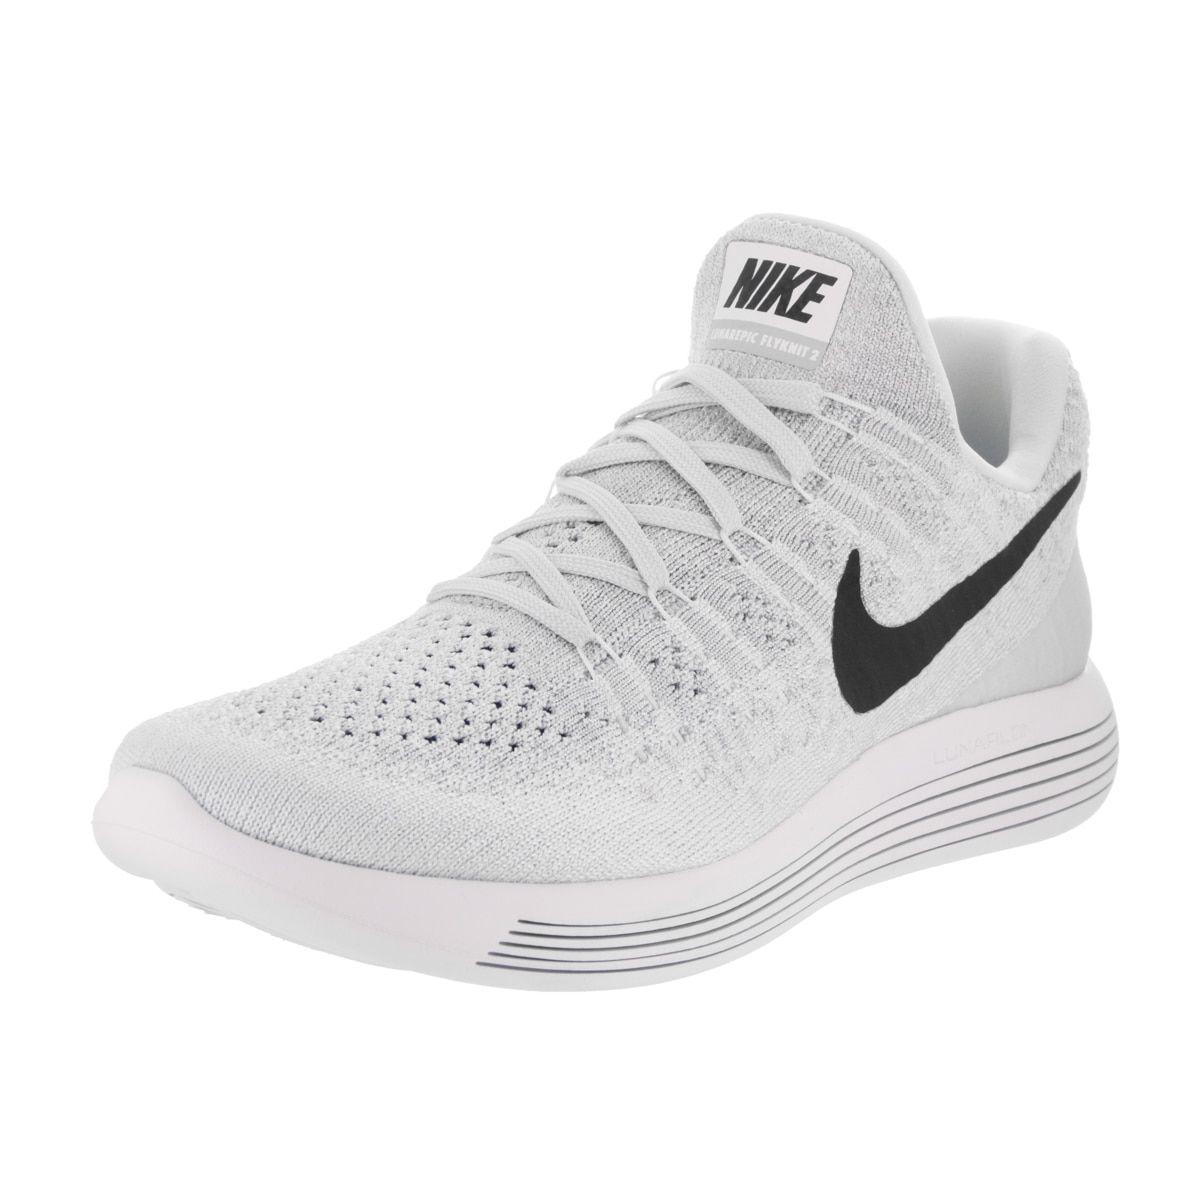 Nike Women's Lunarepic Low Flyknit 2 White/Black/Pure Platinum Running Shoe  9 Women US, Size: 9 Medium